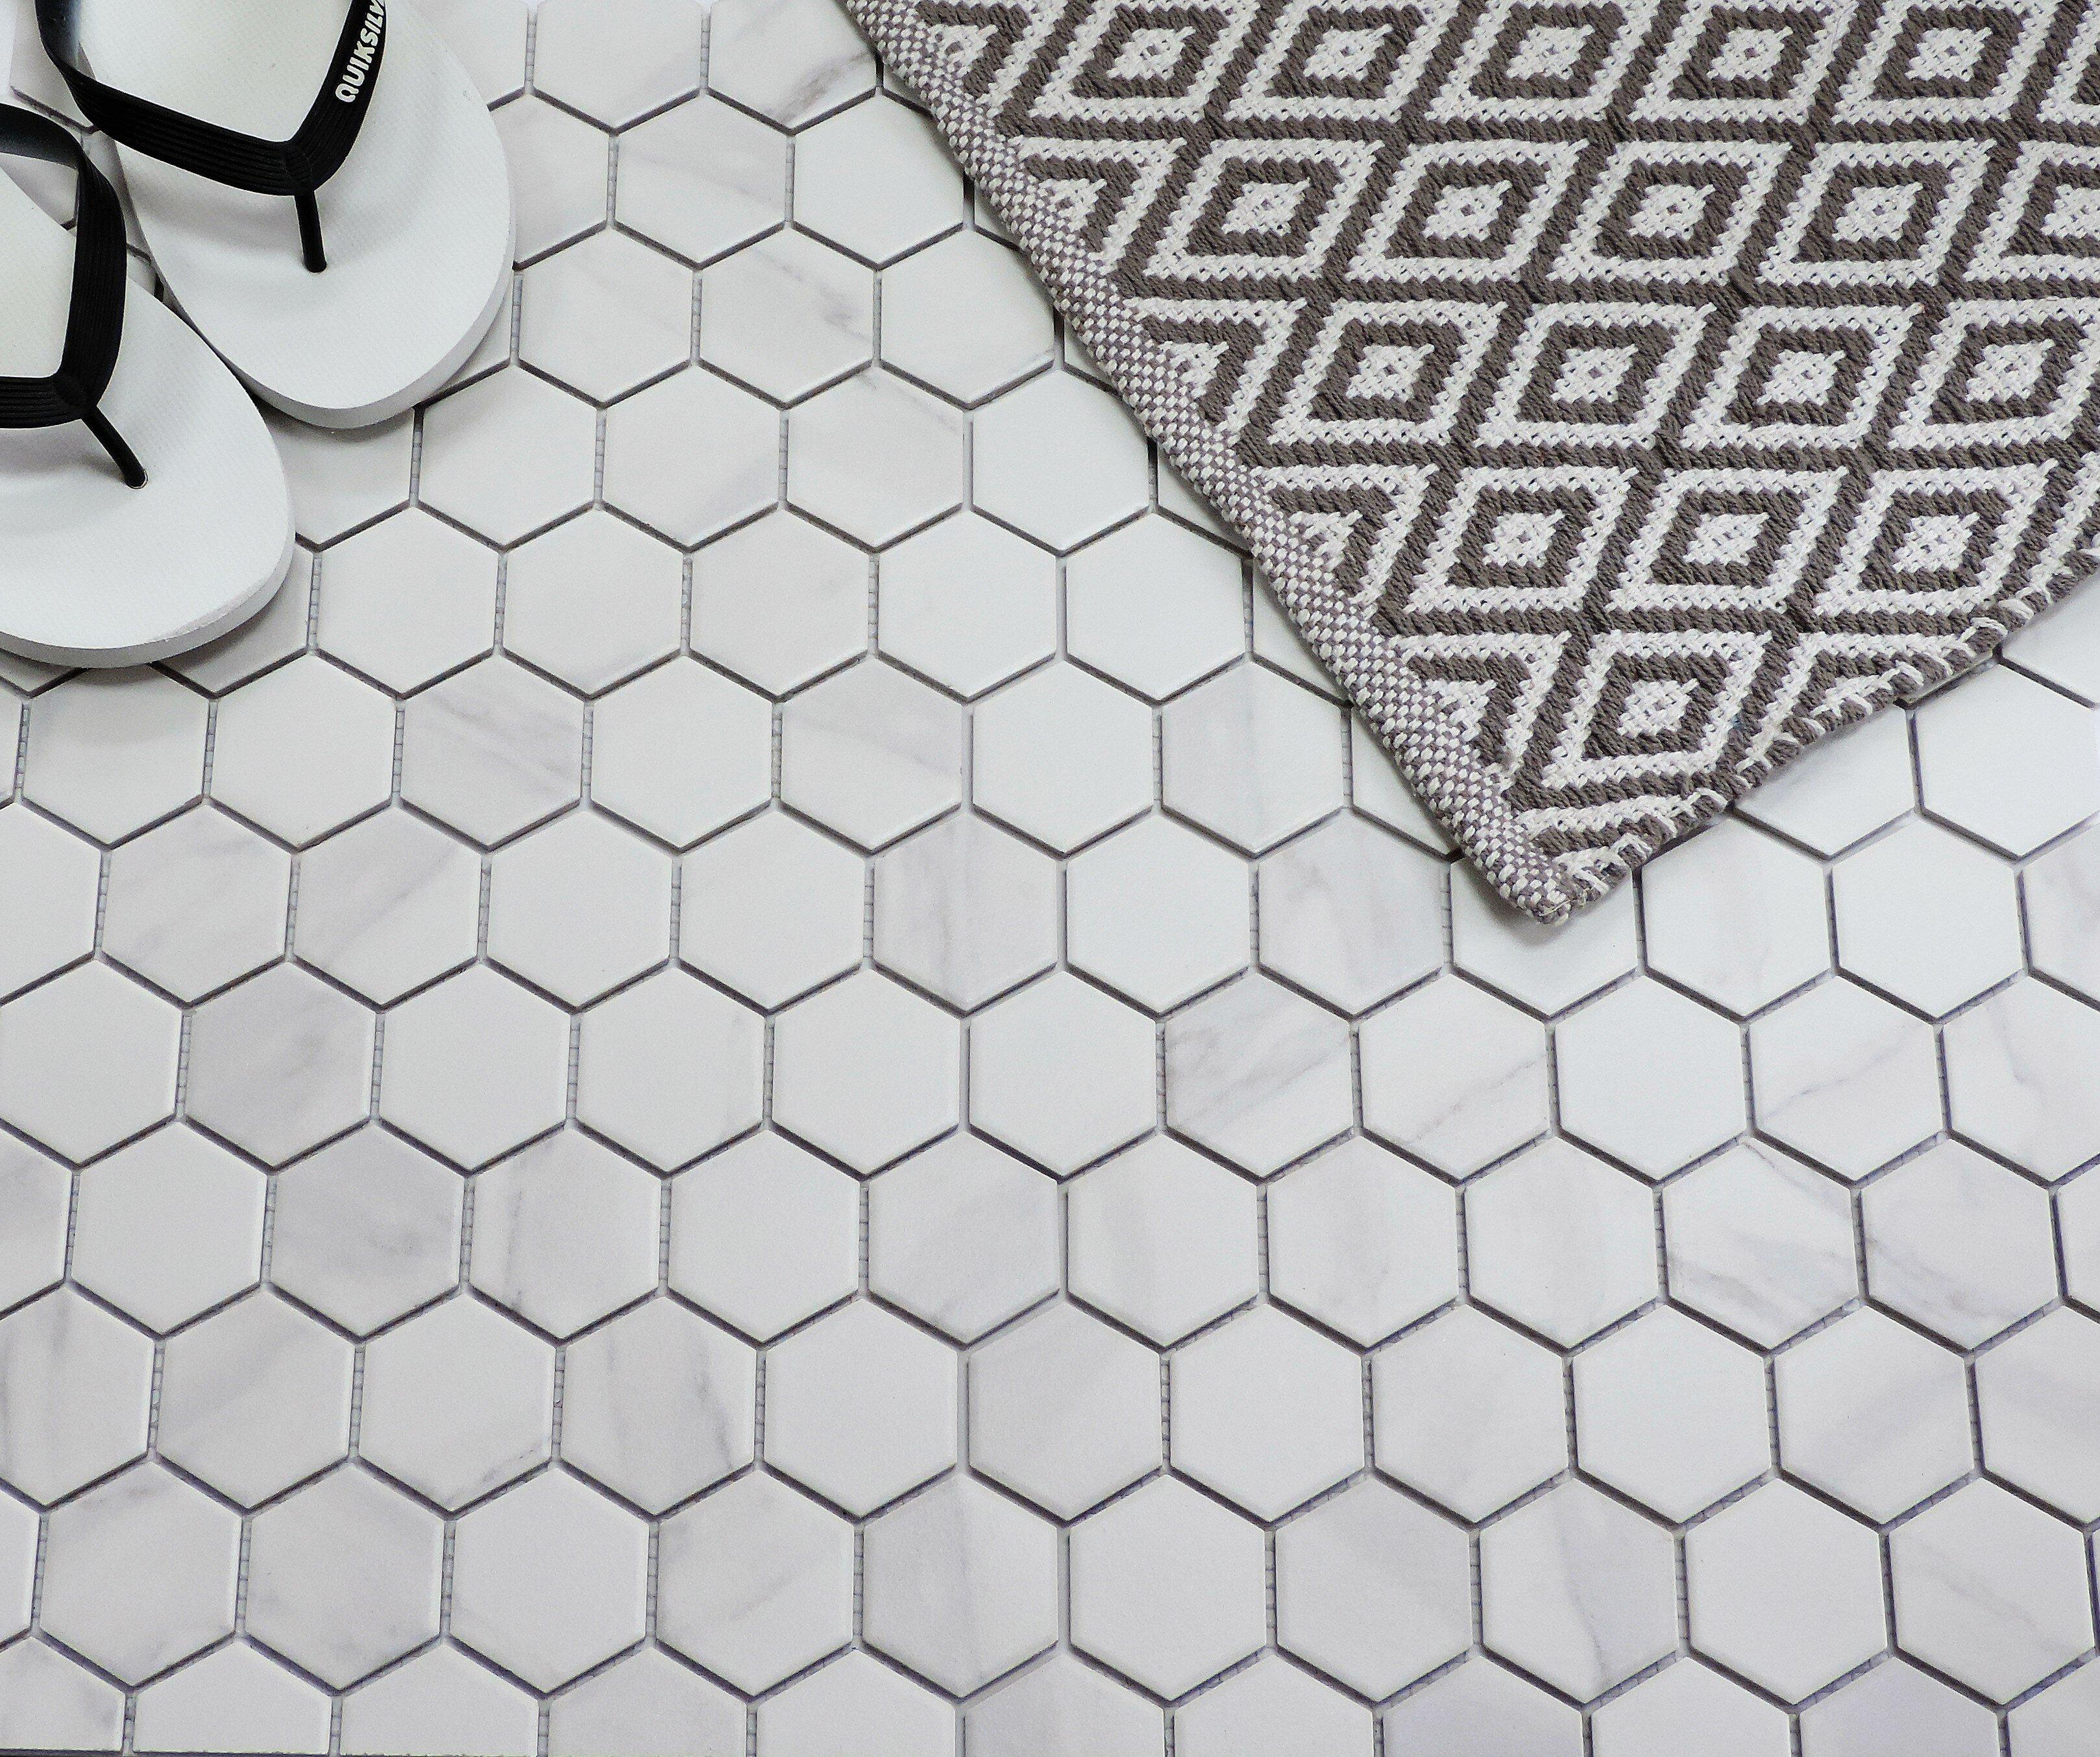 Barcelona 2 X Porcelain Mosaic Tile In Carrara Marble